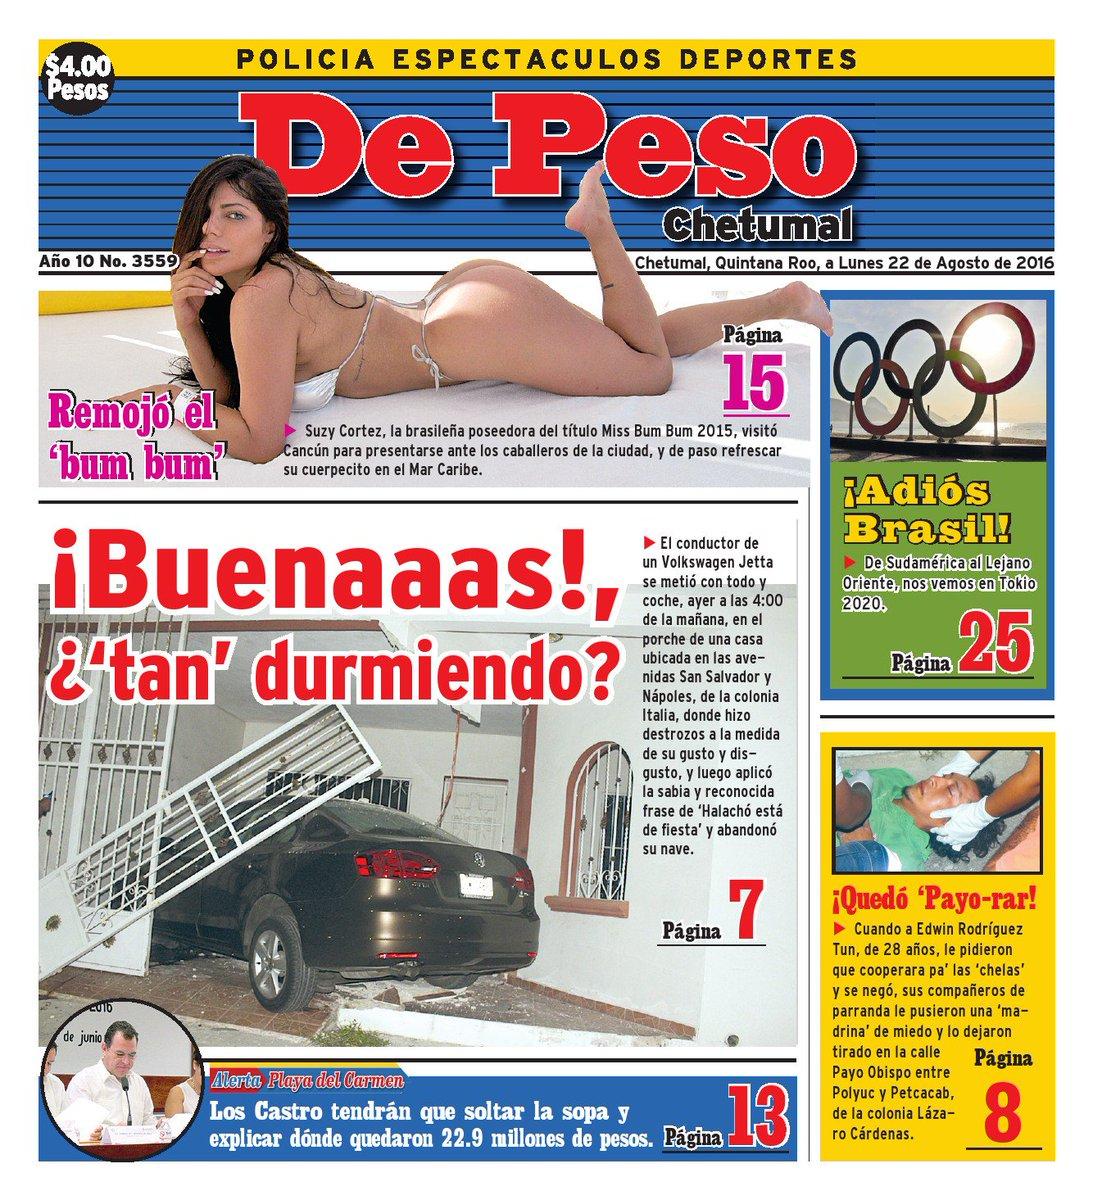 RT @DPesoChetumal: Hoy en Portada #DePesoChetumal  ¡Buenaaas!, ¿'tan' durmiendo? Remojó el 'bum bum'  Adquierelo por $4.00 https://t.co/J5x…